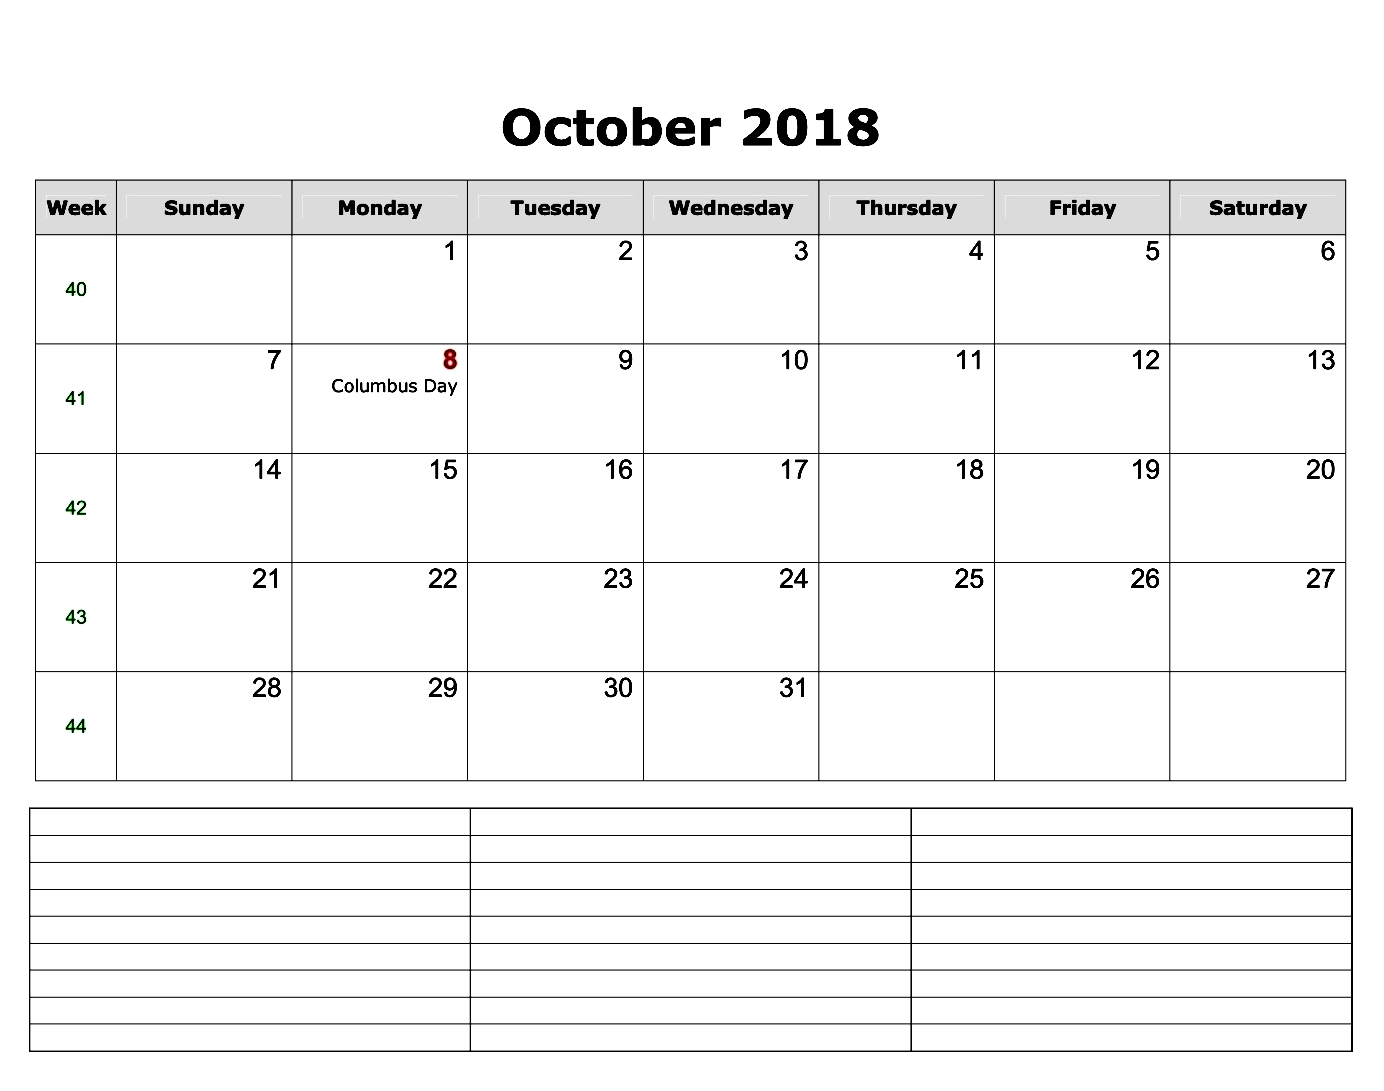 October Calendar 2018 UK